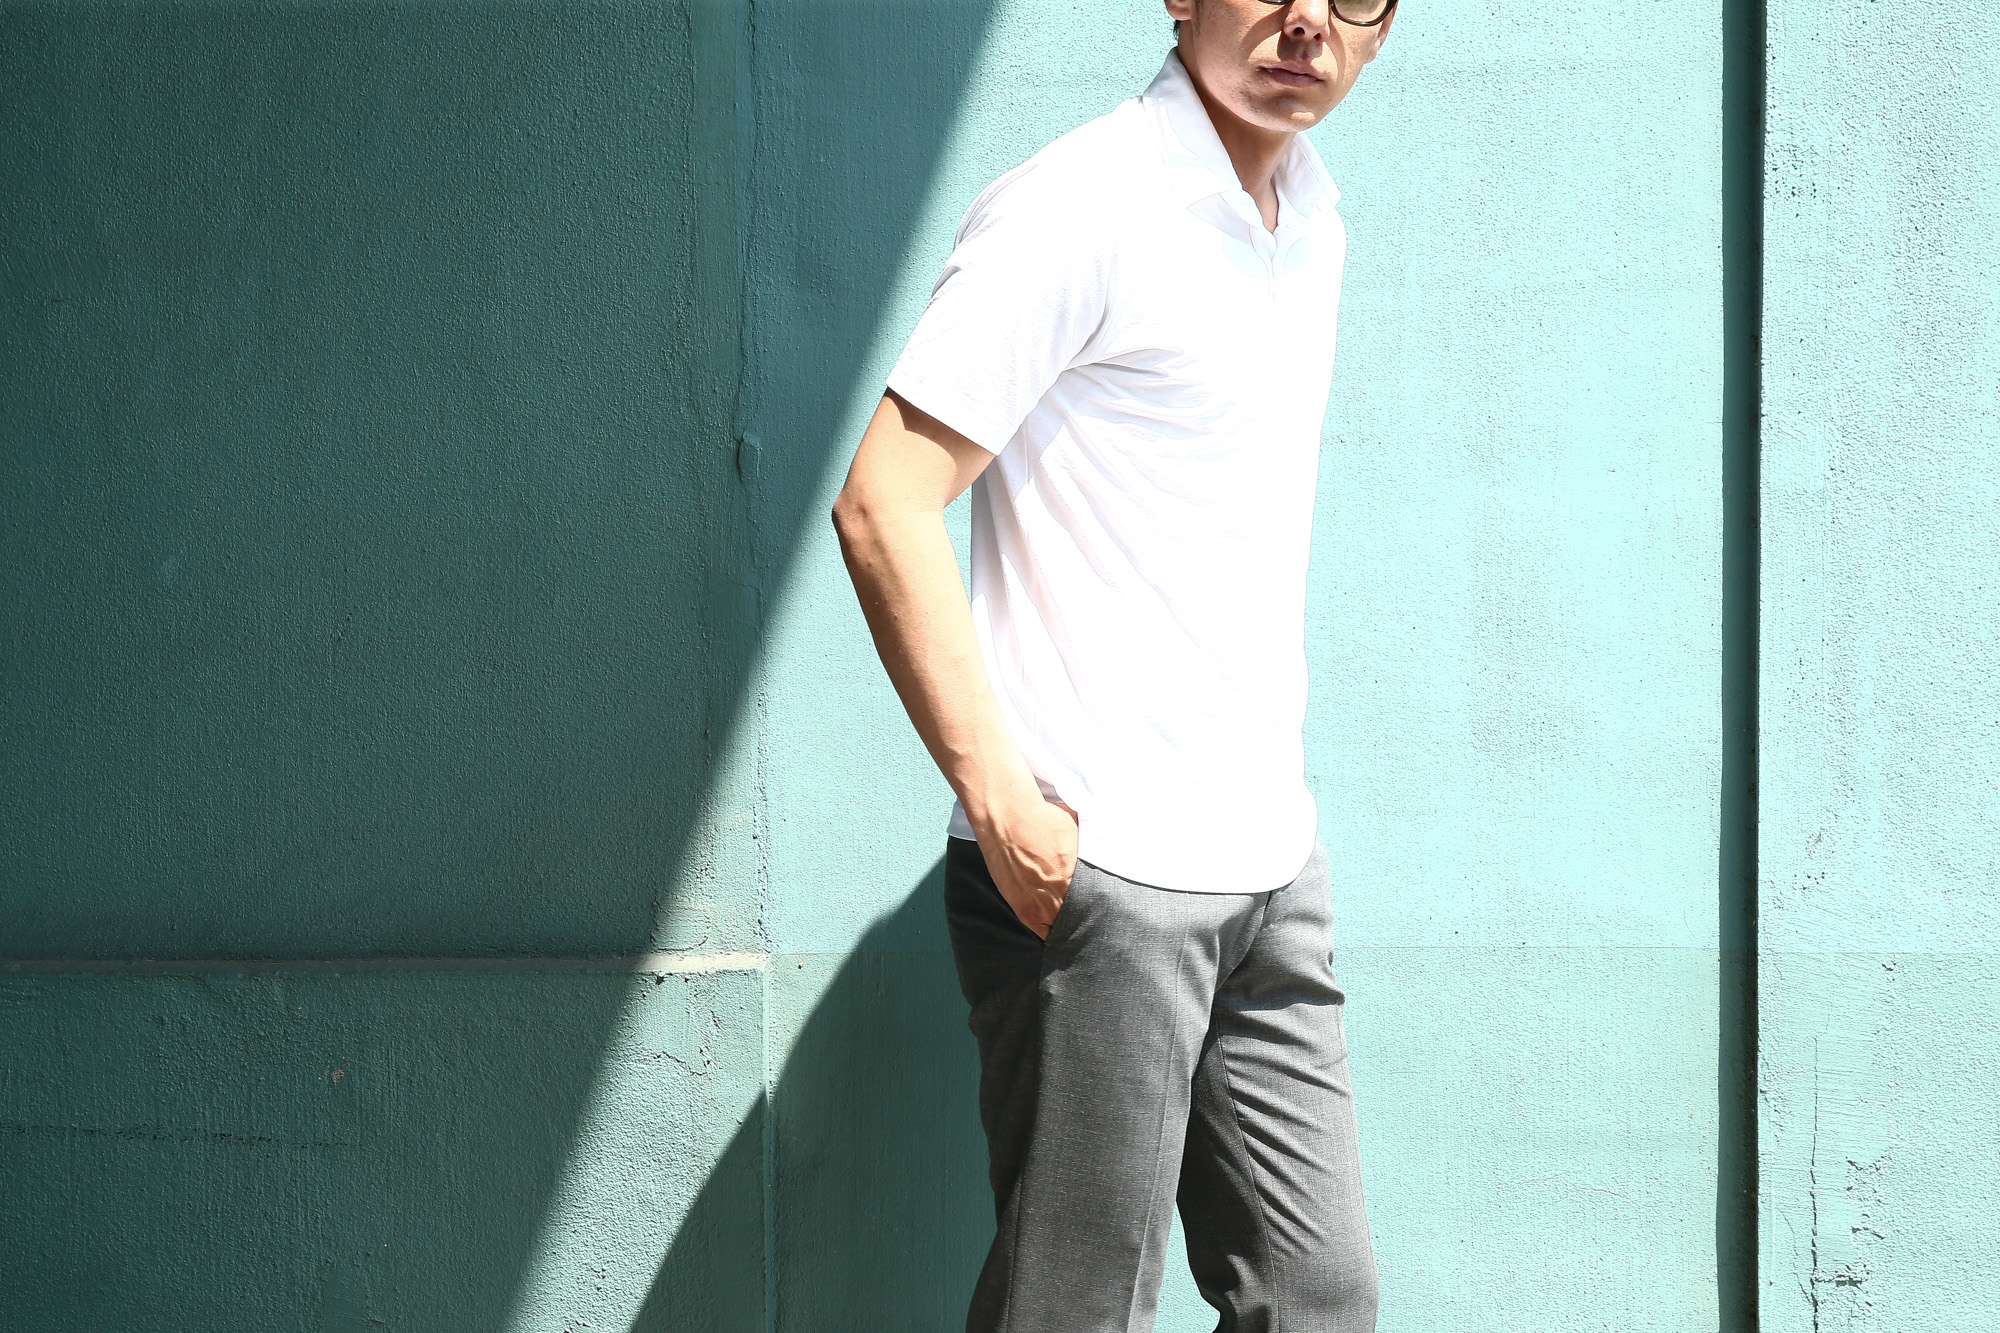 ZANONE (ザノーネ) Polo Shirt ice cotton アイスコットン ポロシャツ WHITE (ホワイト・Z0001) made in italy (イタリア製) 2018 春夏新作 愛知 名古屋 Alto e Diritto アルト エ デリット ポロ ニットポロ